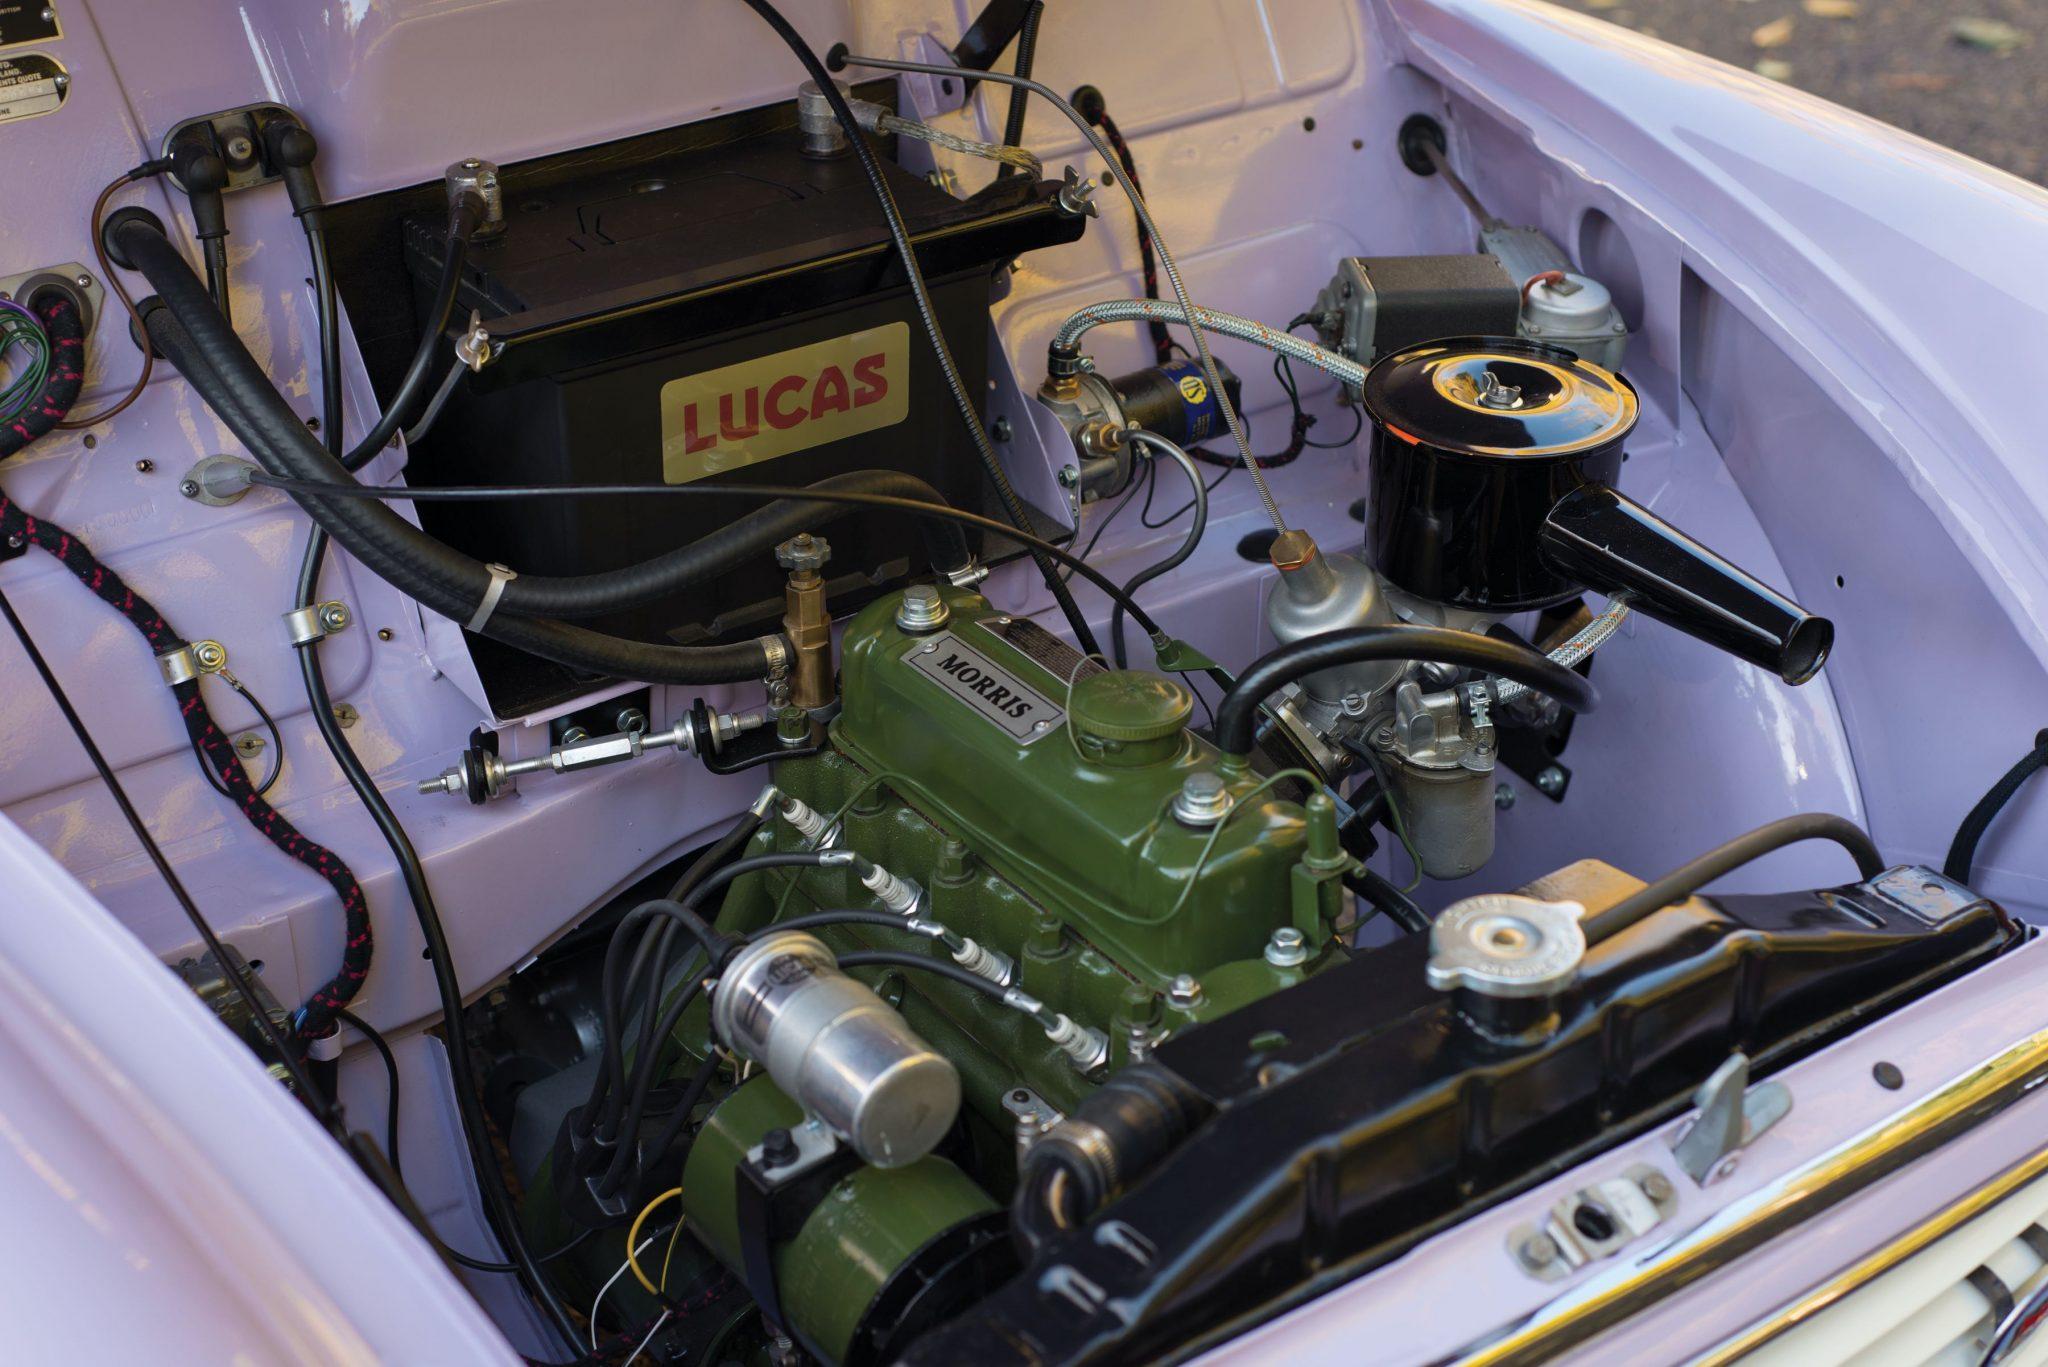 A-Series engine